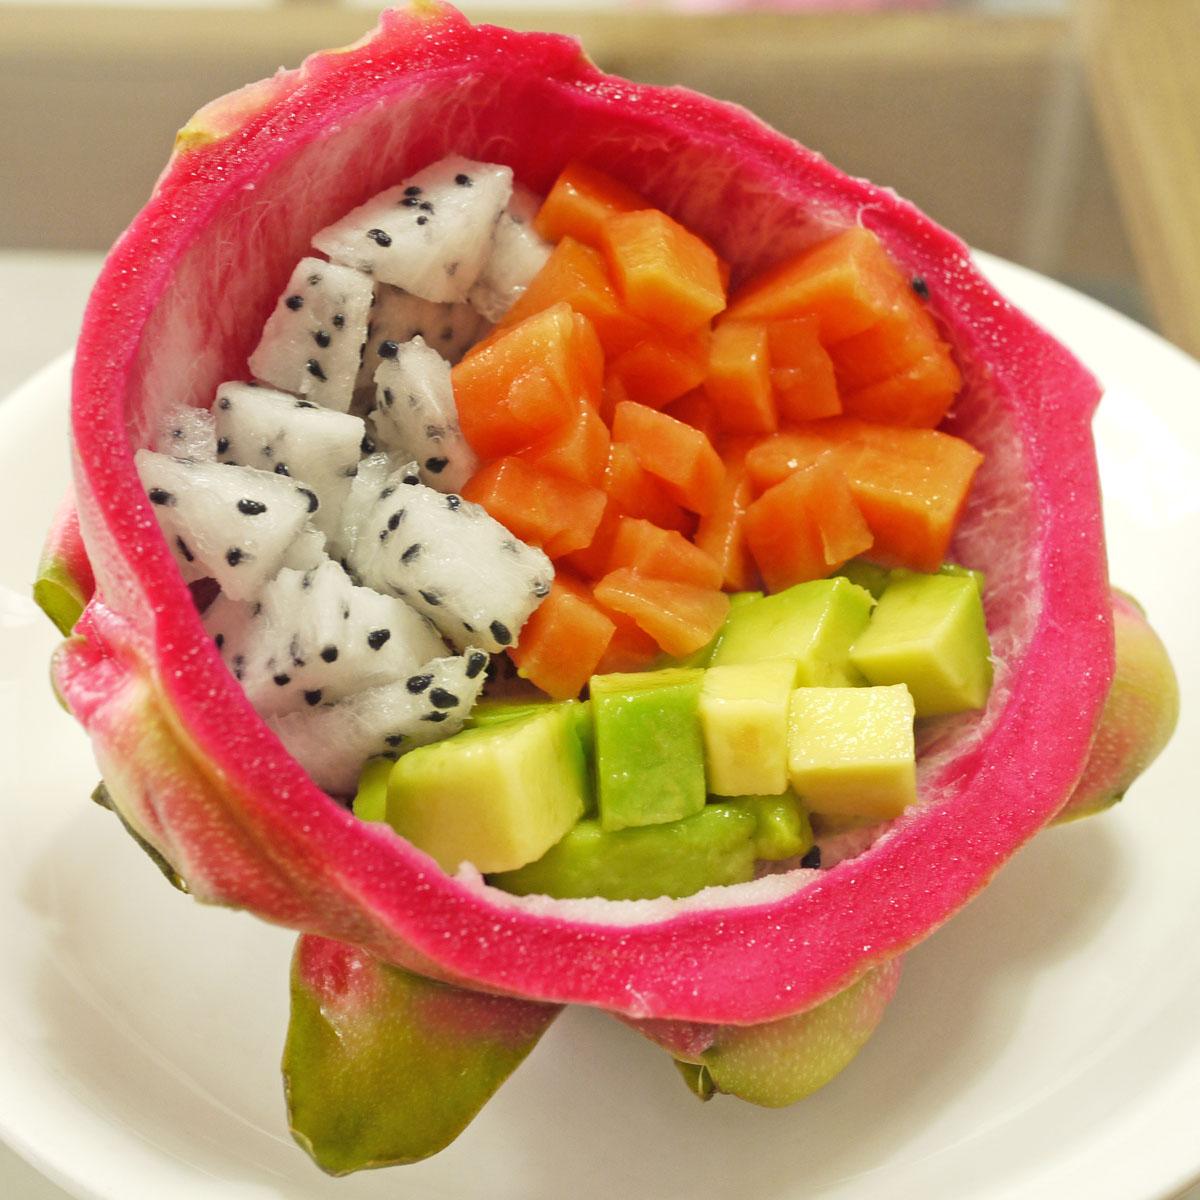 It's Baby Crustabakes breakfast fruit cup.